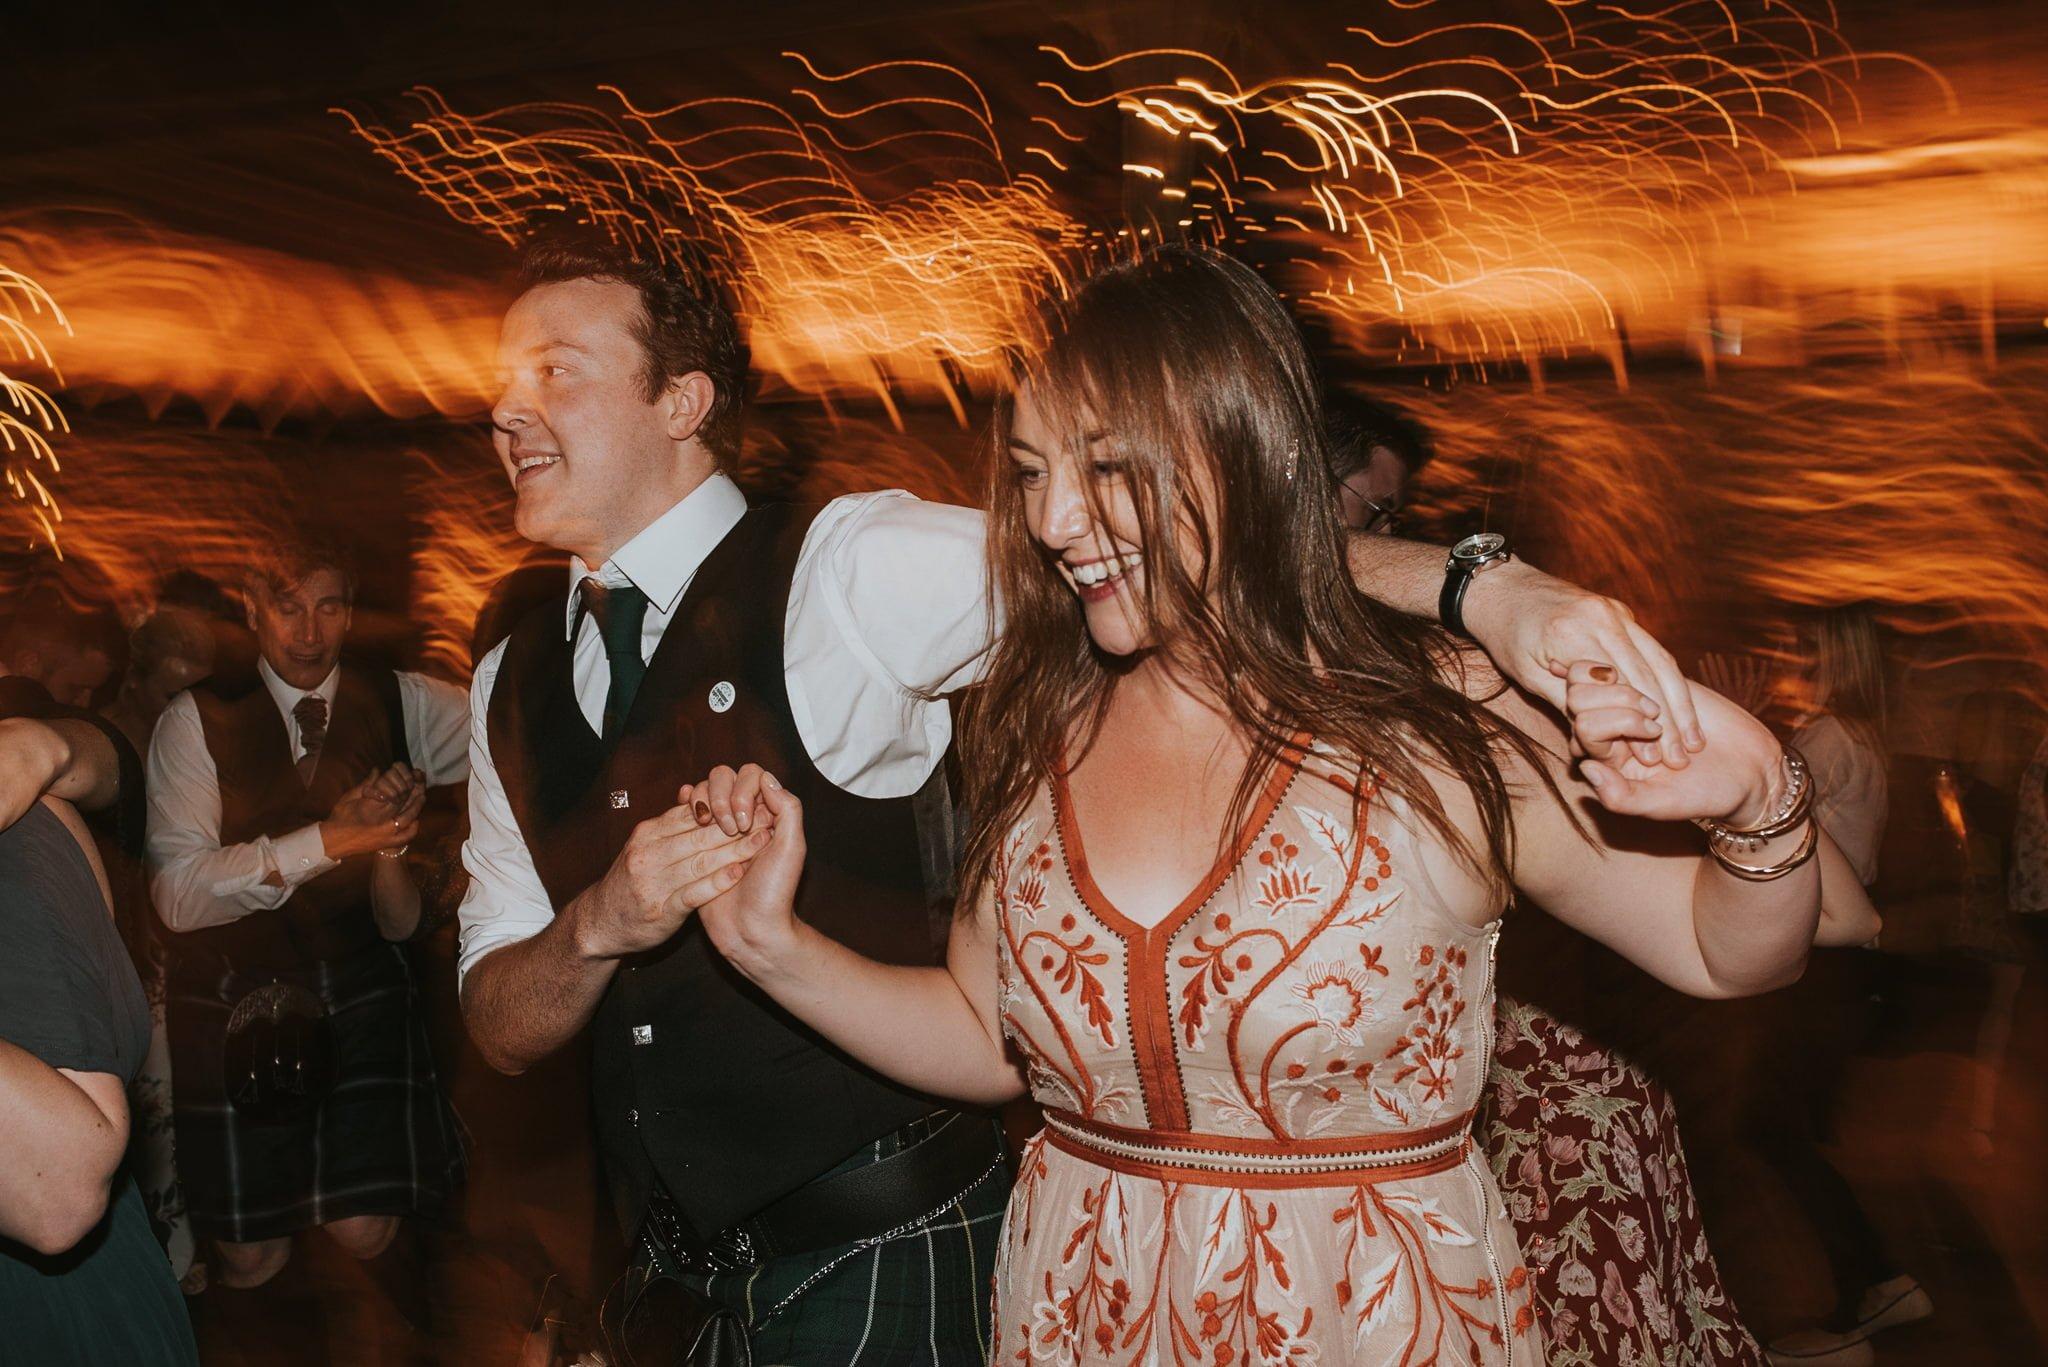 ceilidh dancing at kinkell byre